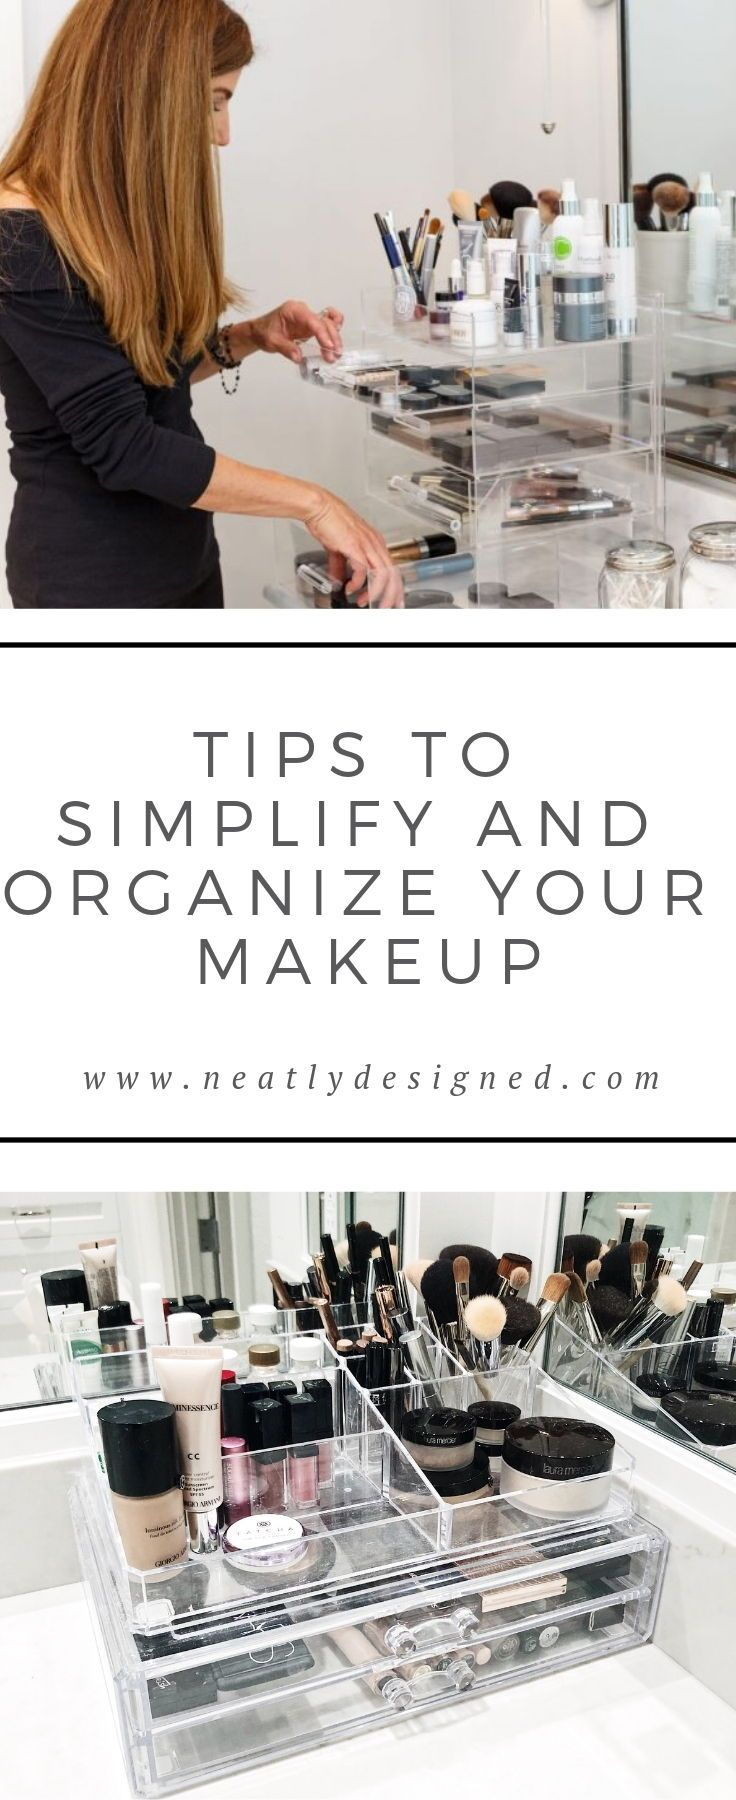 24 Pin on Organized Hair & Makeup